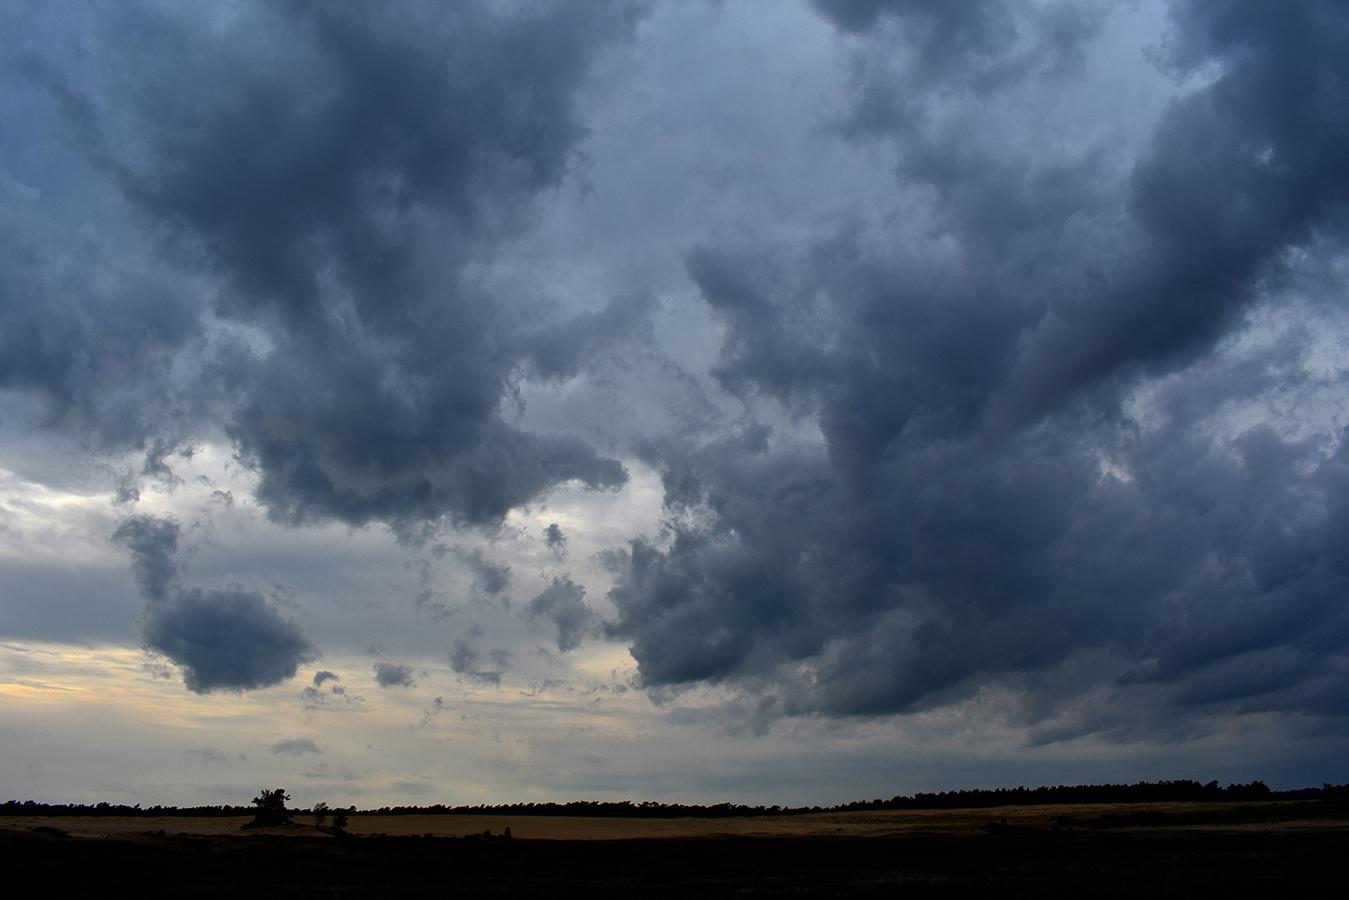 Donkere wolken pakten zich samen boven het Middenzand - Foto: ©Louis Fraanje